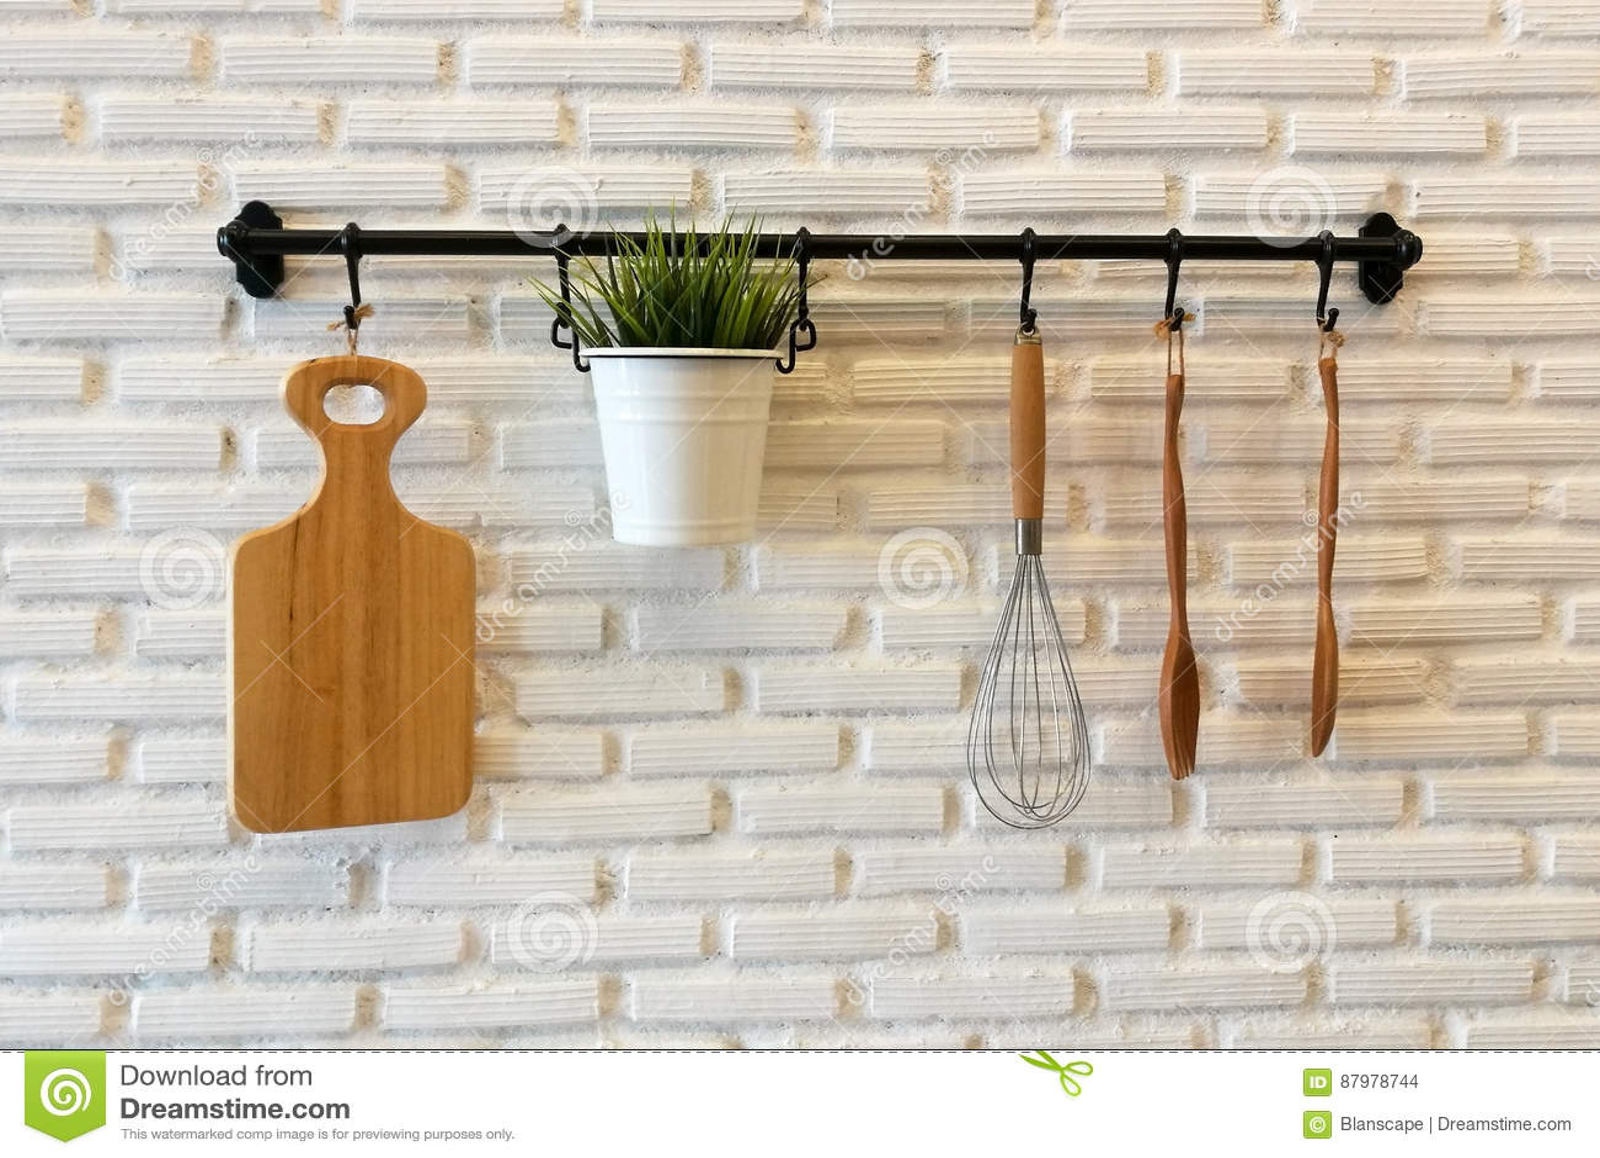 Keuken decoratie muur vlakte stip muur papierrol vinyl moderne d